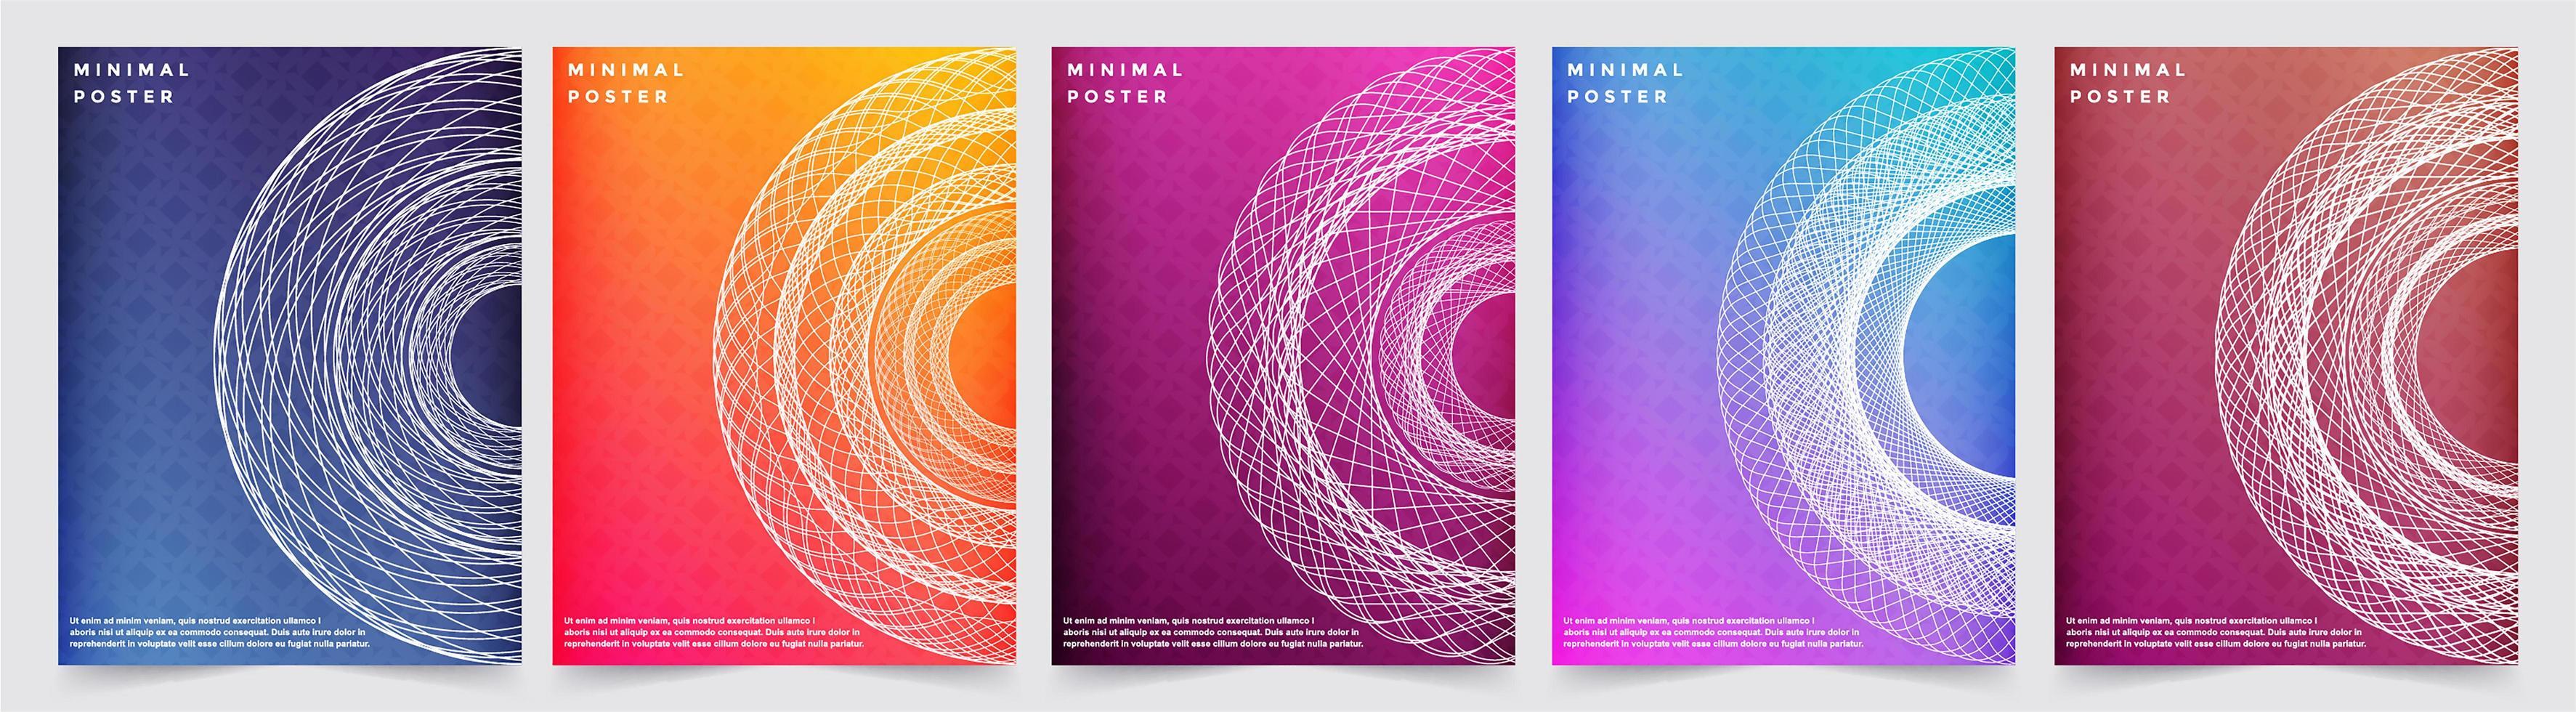 abstrakte bunte minimale Abdeckungsmusterentwürfe vektor